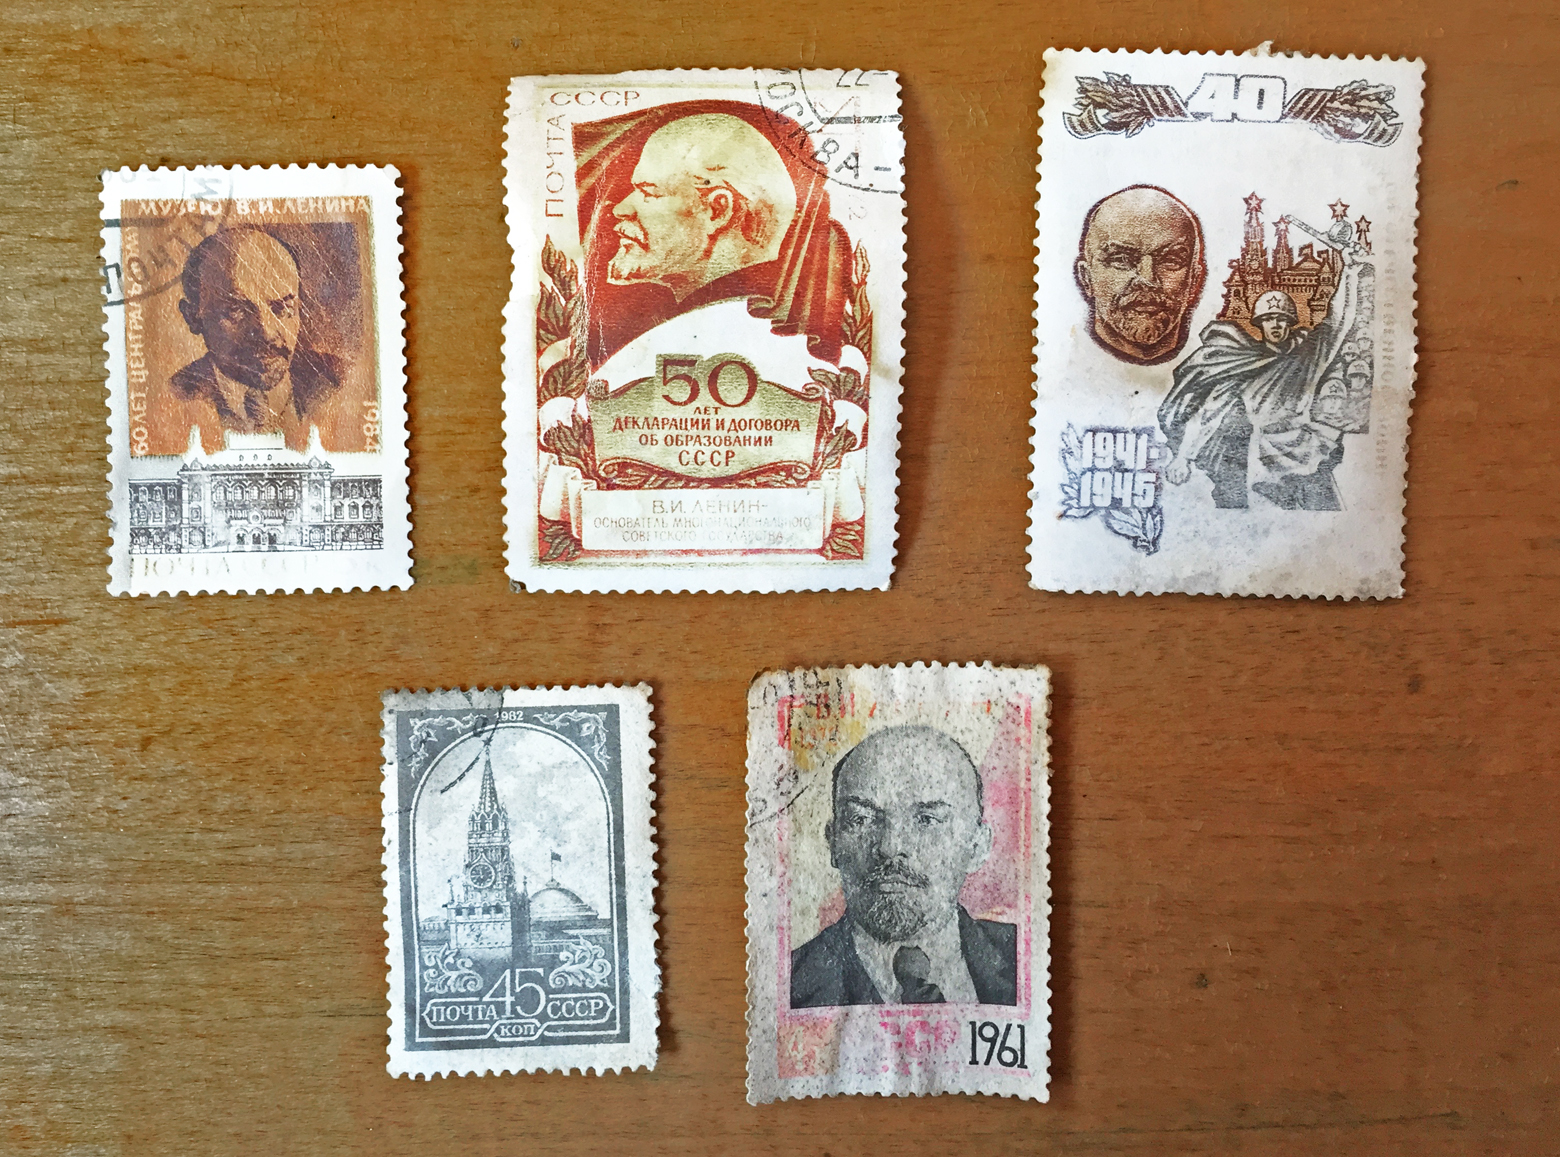 Chernobyl Stamps